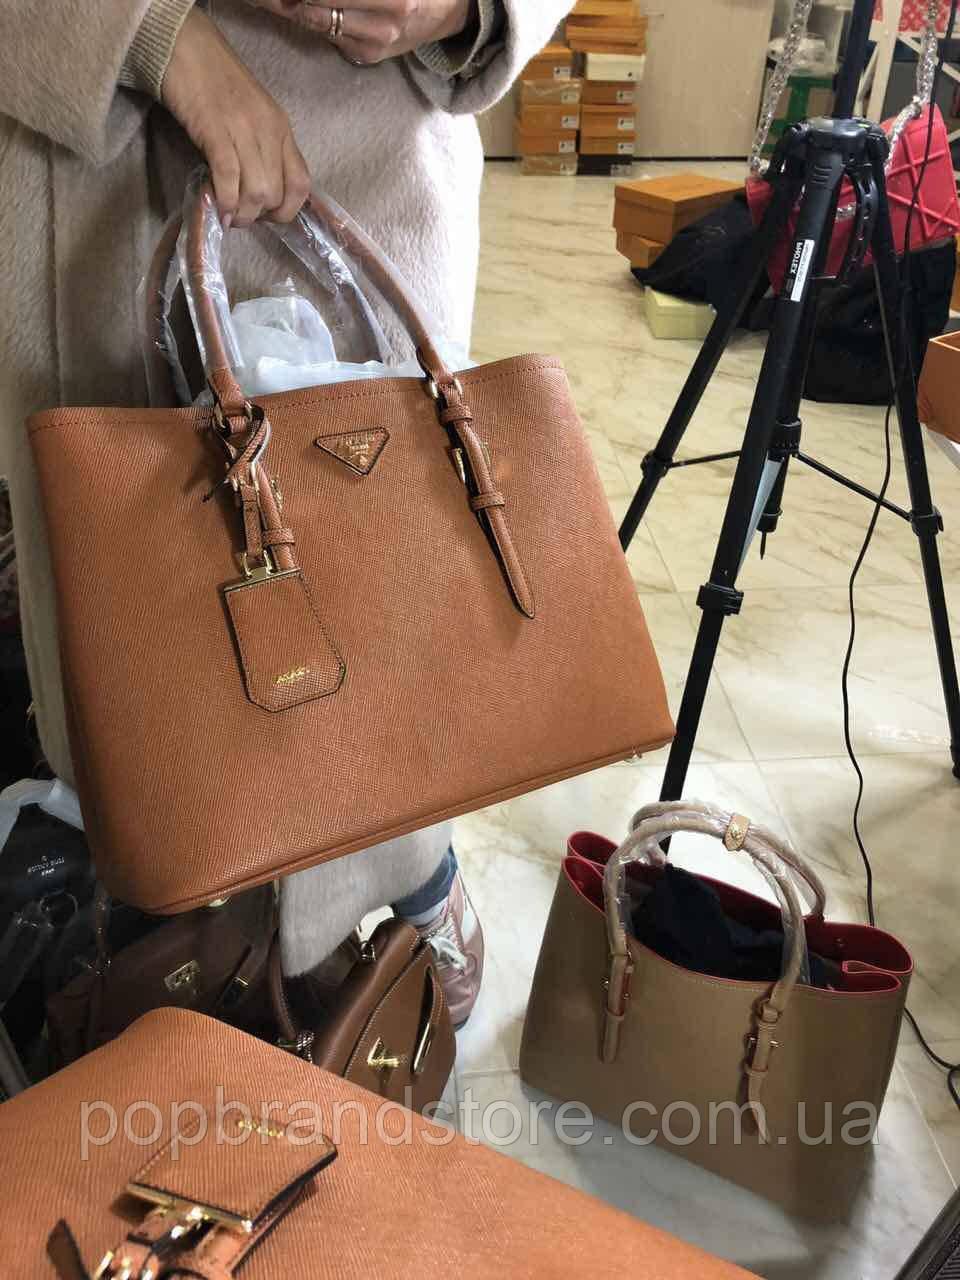 53afd29e73ca Модная женская сумкам PRADA cuir double bag коричневая (реплика) - Pop  Brand Store